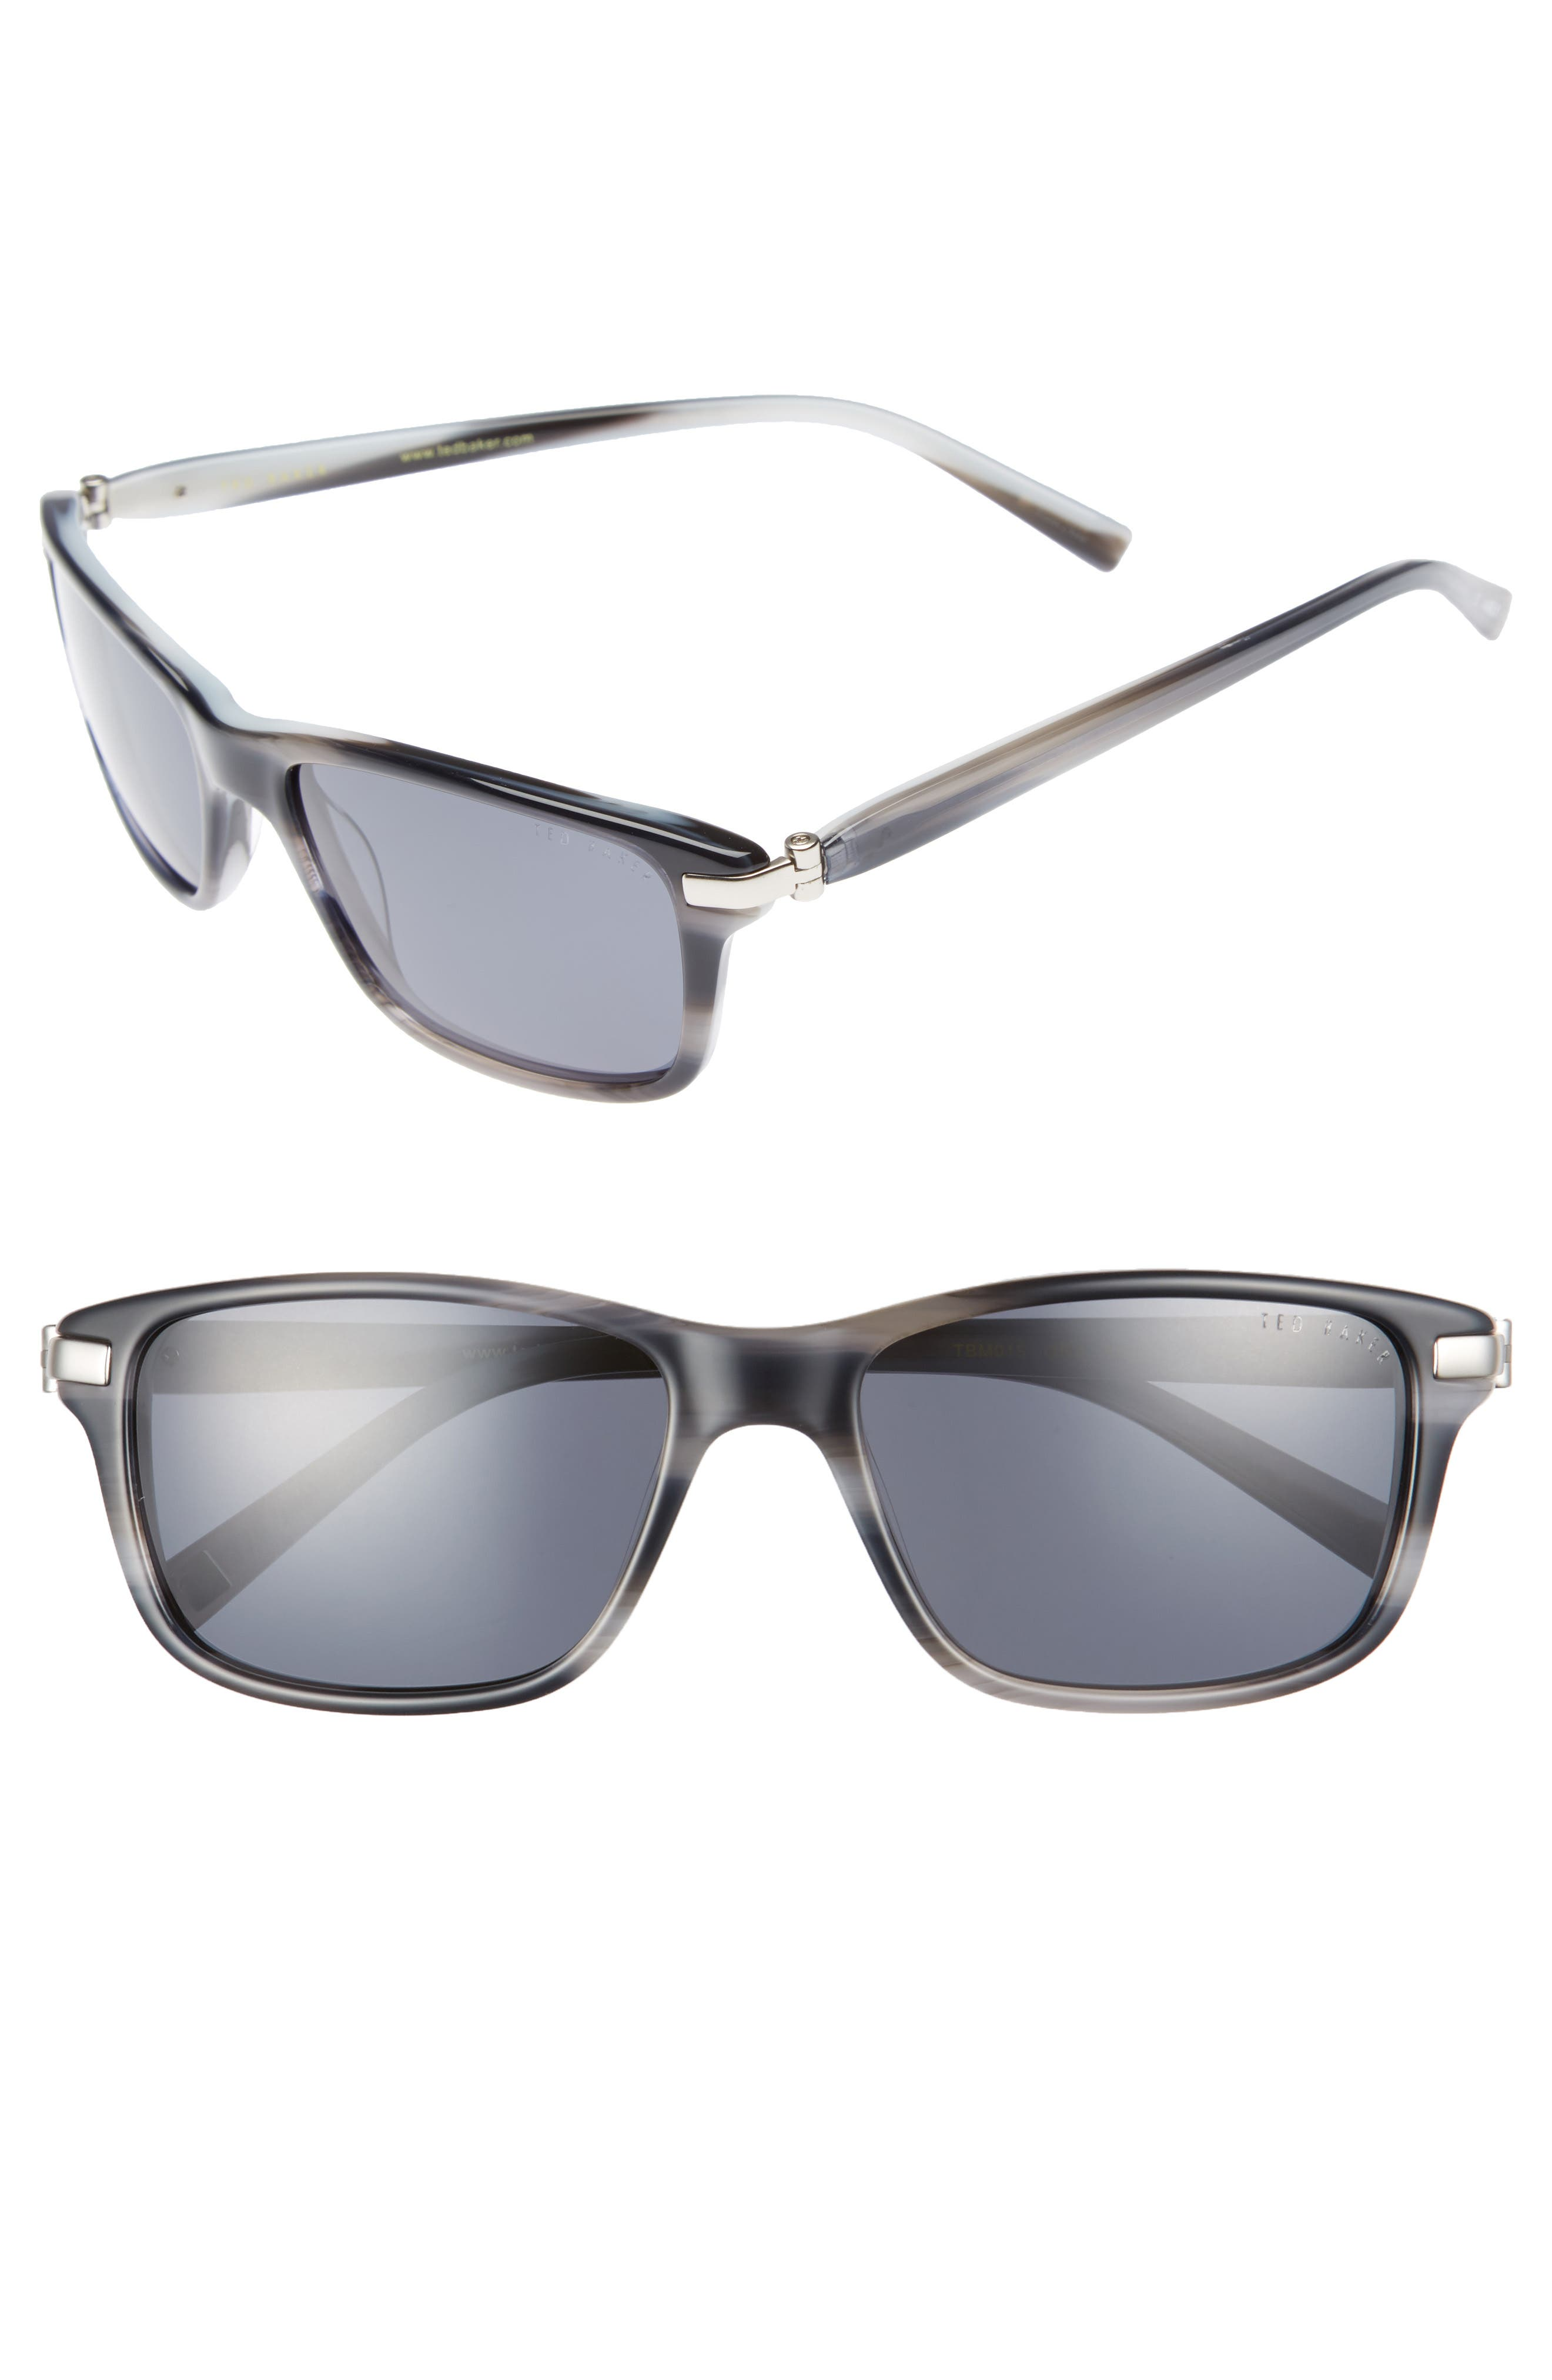 55mm Polarized Sunglasses,                         Main,                         color, Grey